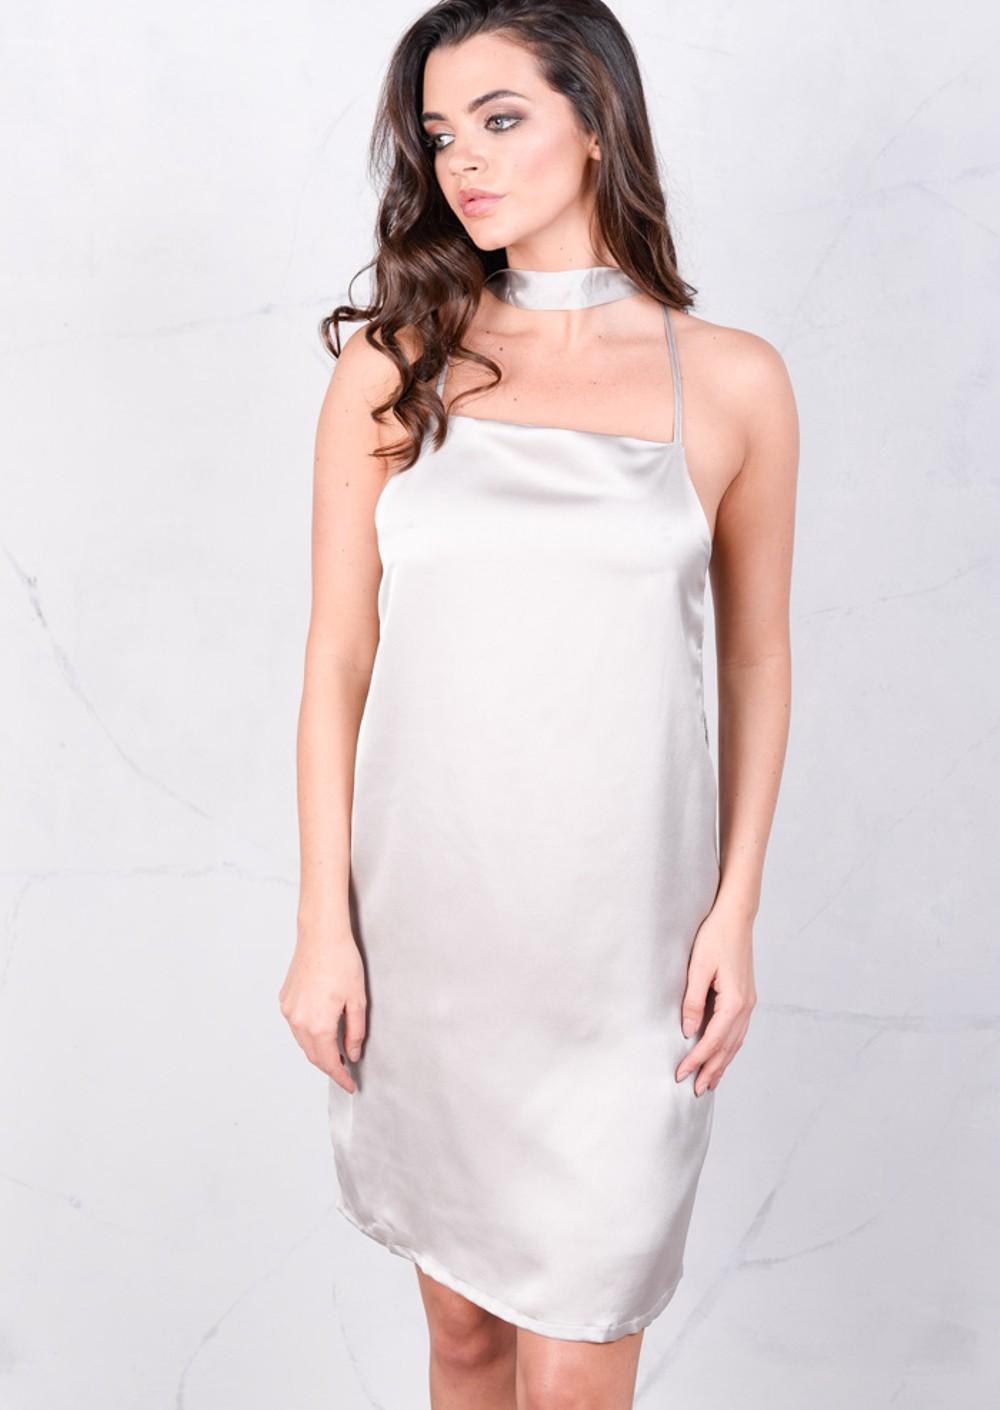 Satin Belted Metallic Silky Cami Spaghetti Strap Dress ...